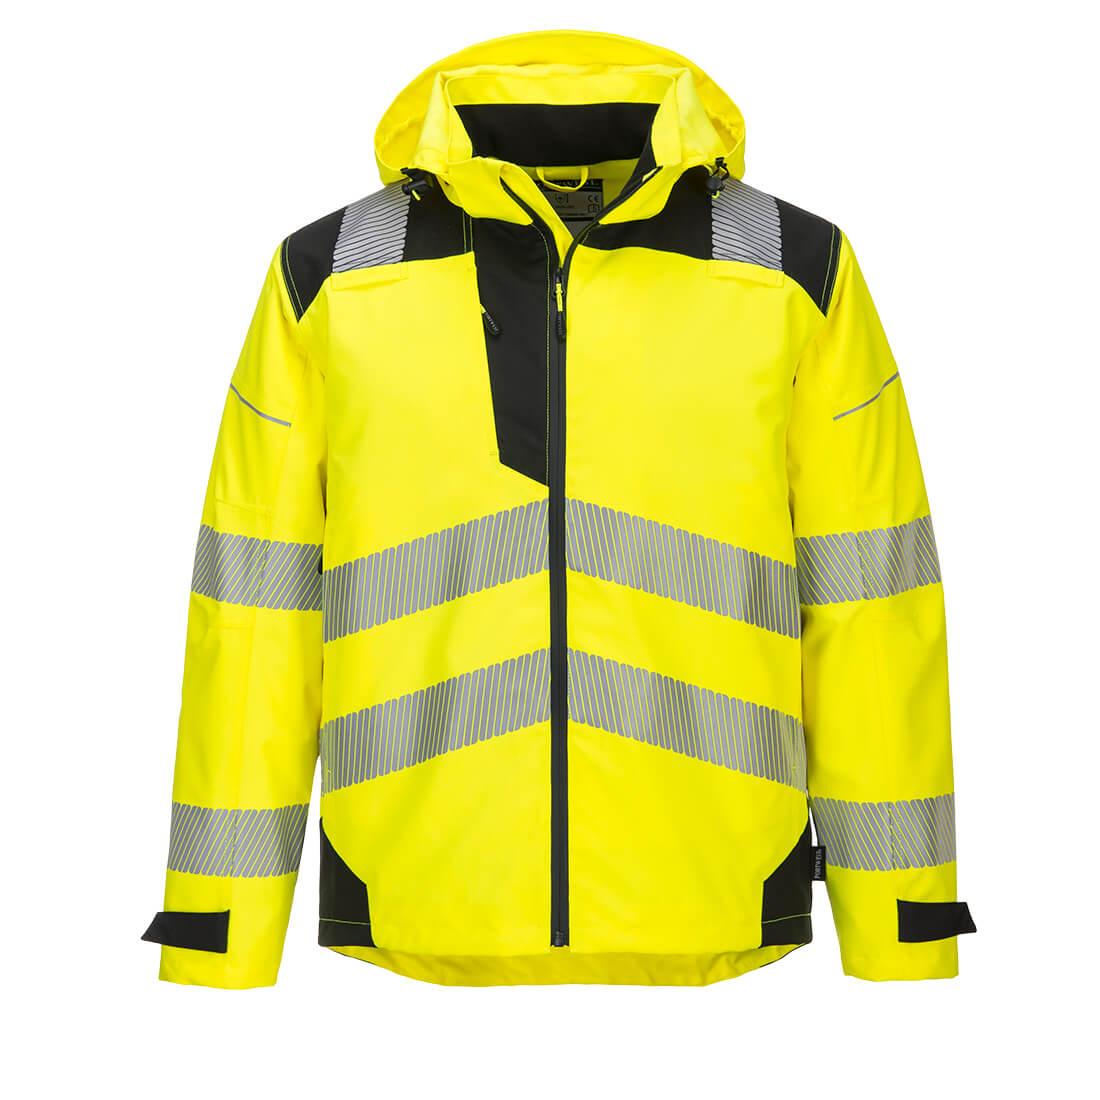 PW3 Extreme Breathable Rain Jacket Yellow/Black Medium